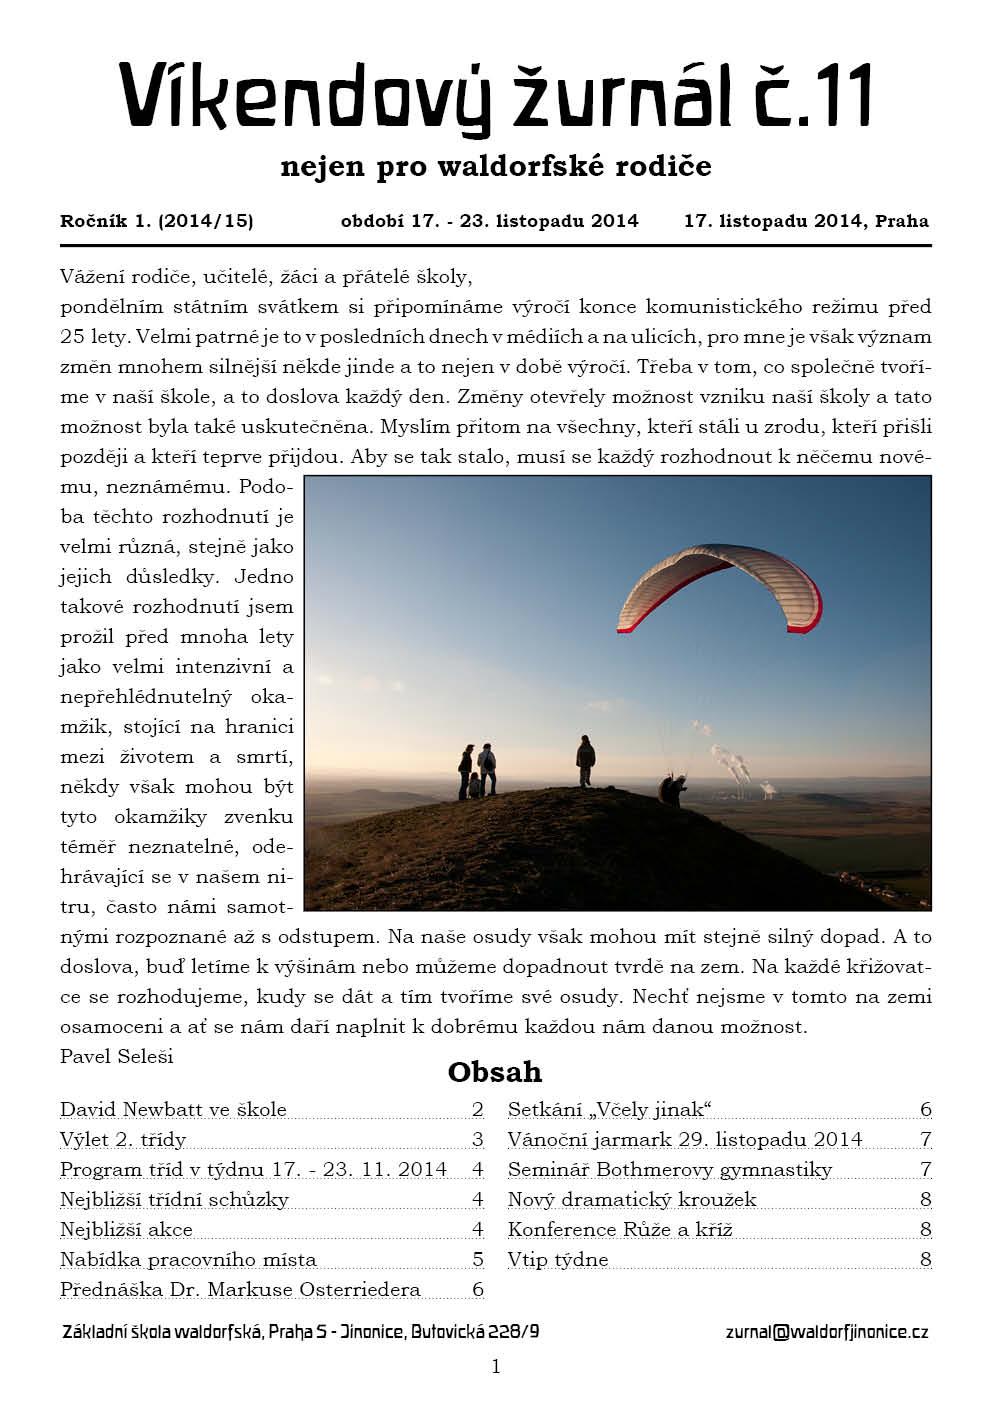 Žurnál 1.11